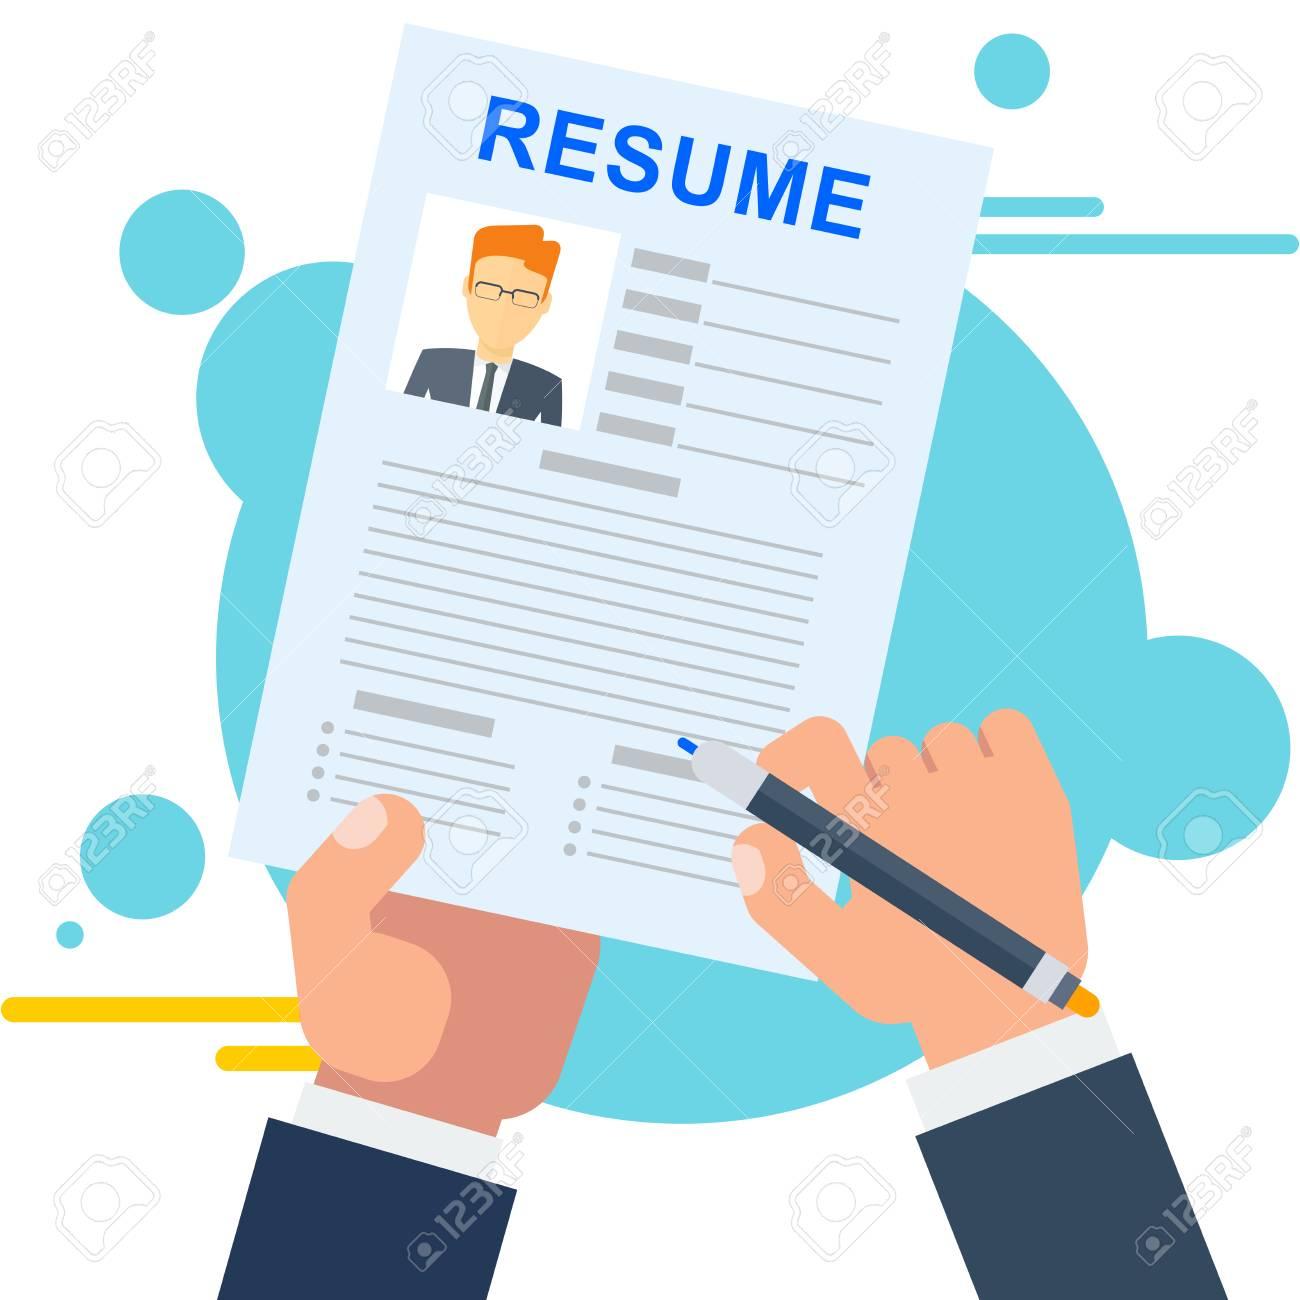 Resume Of Potential Employee Job Seekers And Vacancies Hiring